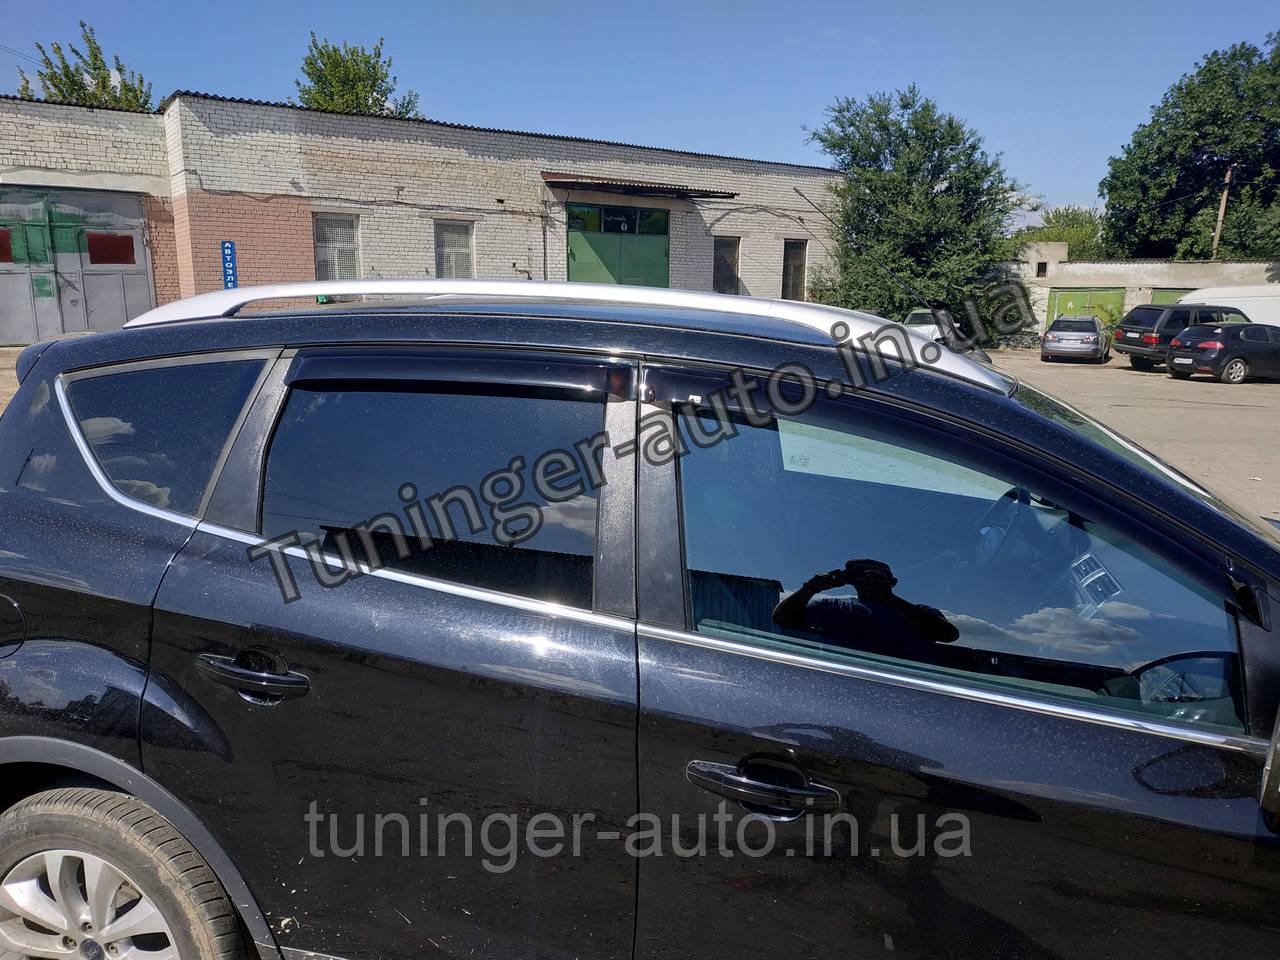 Ветровики, дефлекторы окон Ford Kuga 2008-2013 (EGR/Australia)